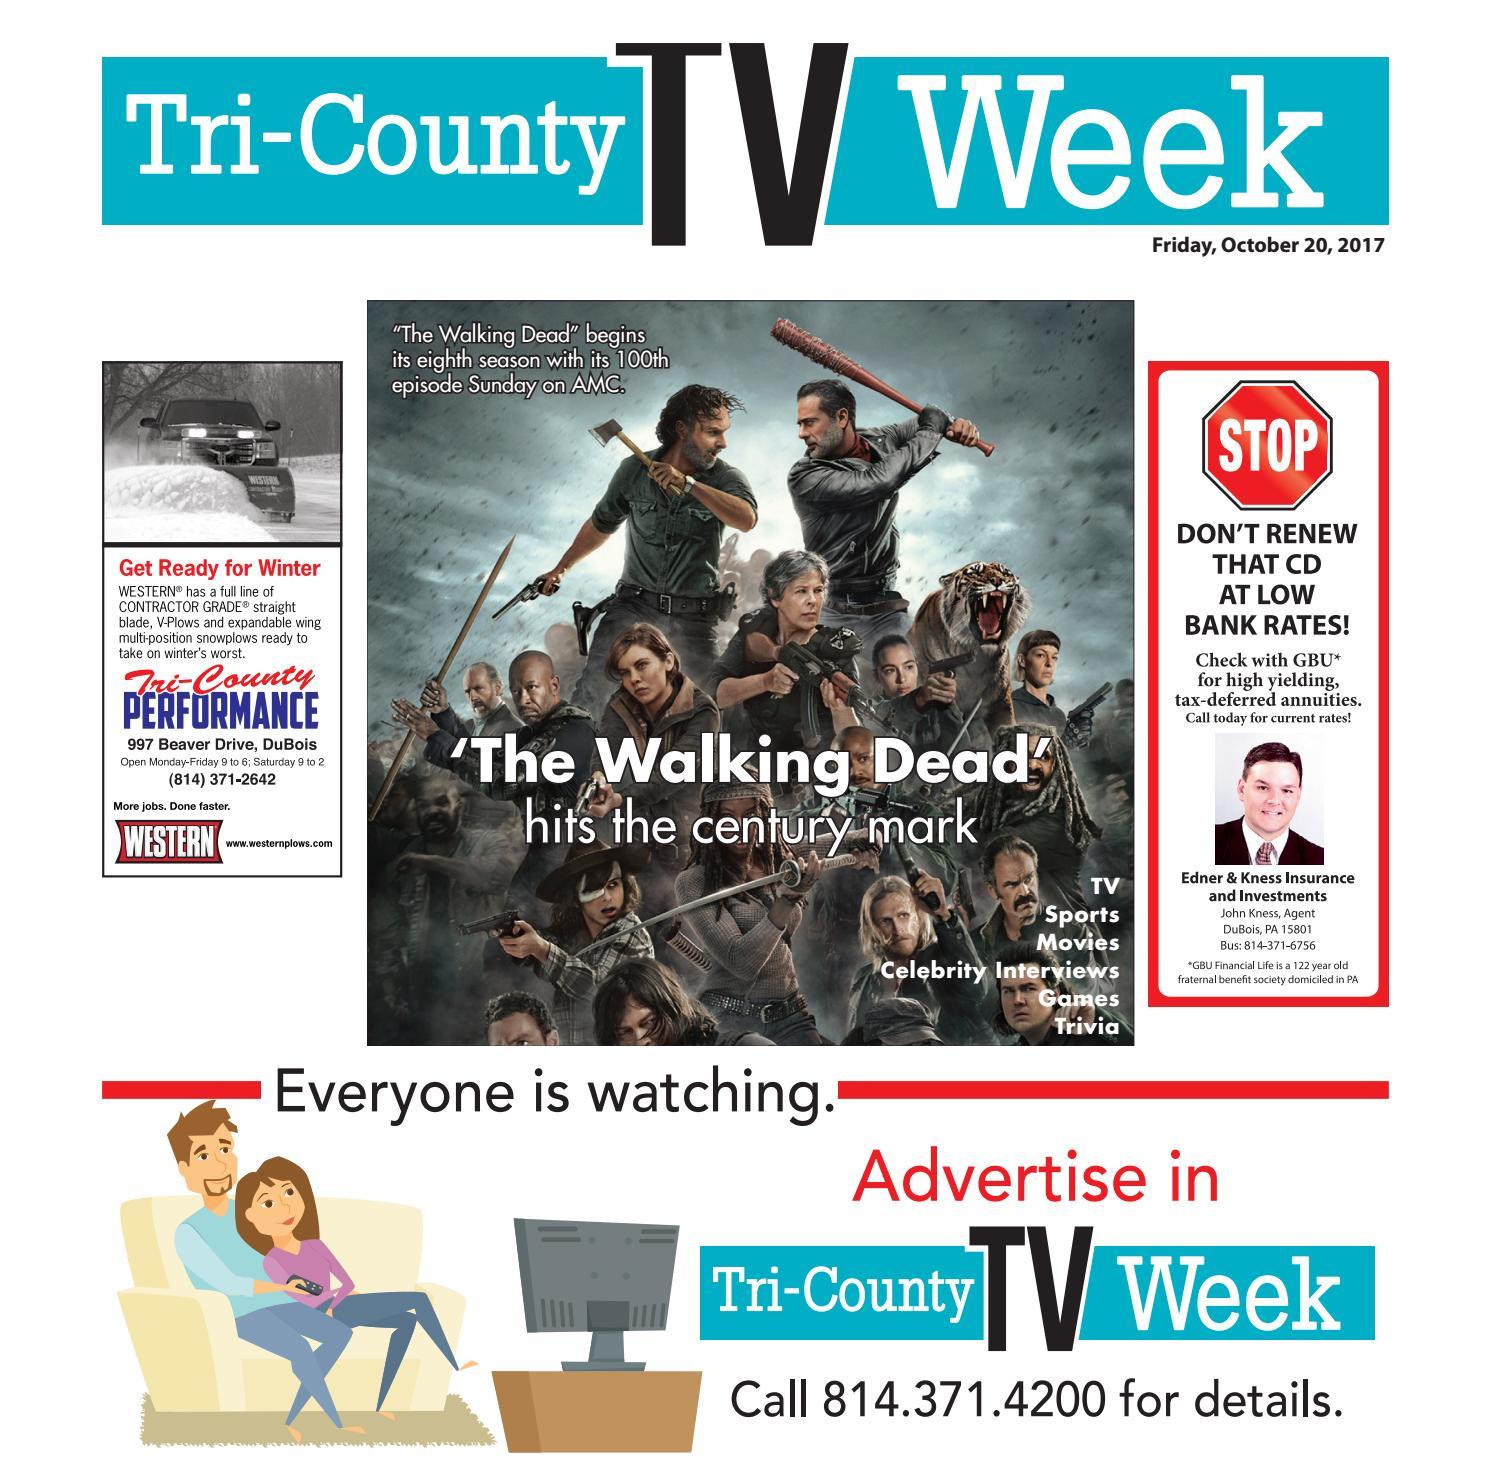 TV Week 10/20/2017 by Tri-County TV Week - issuu